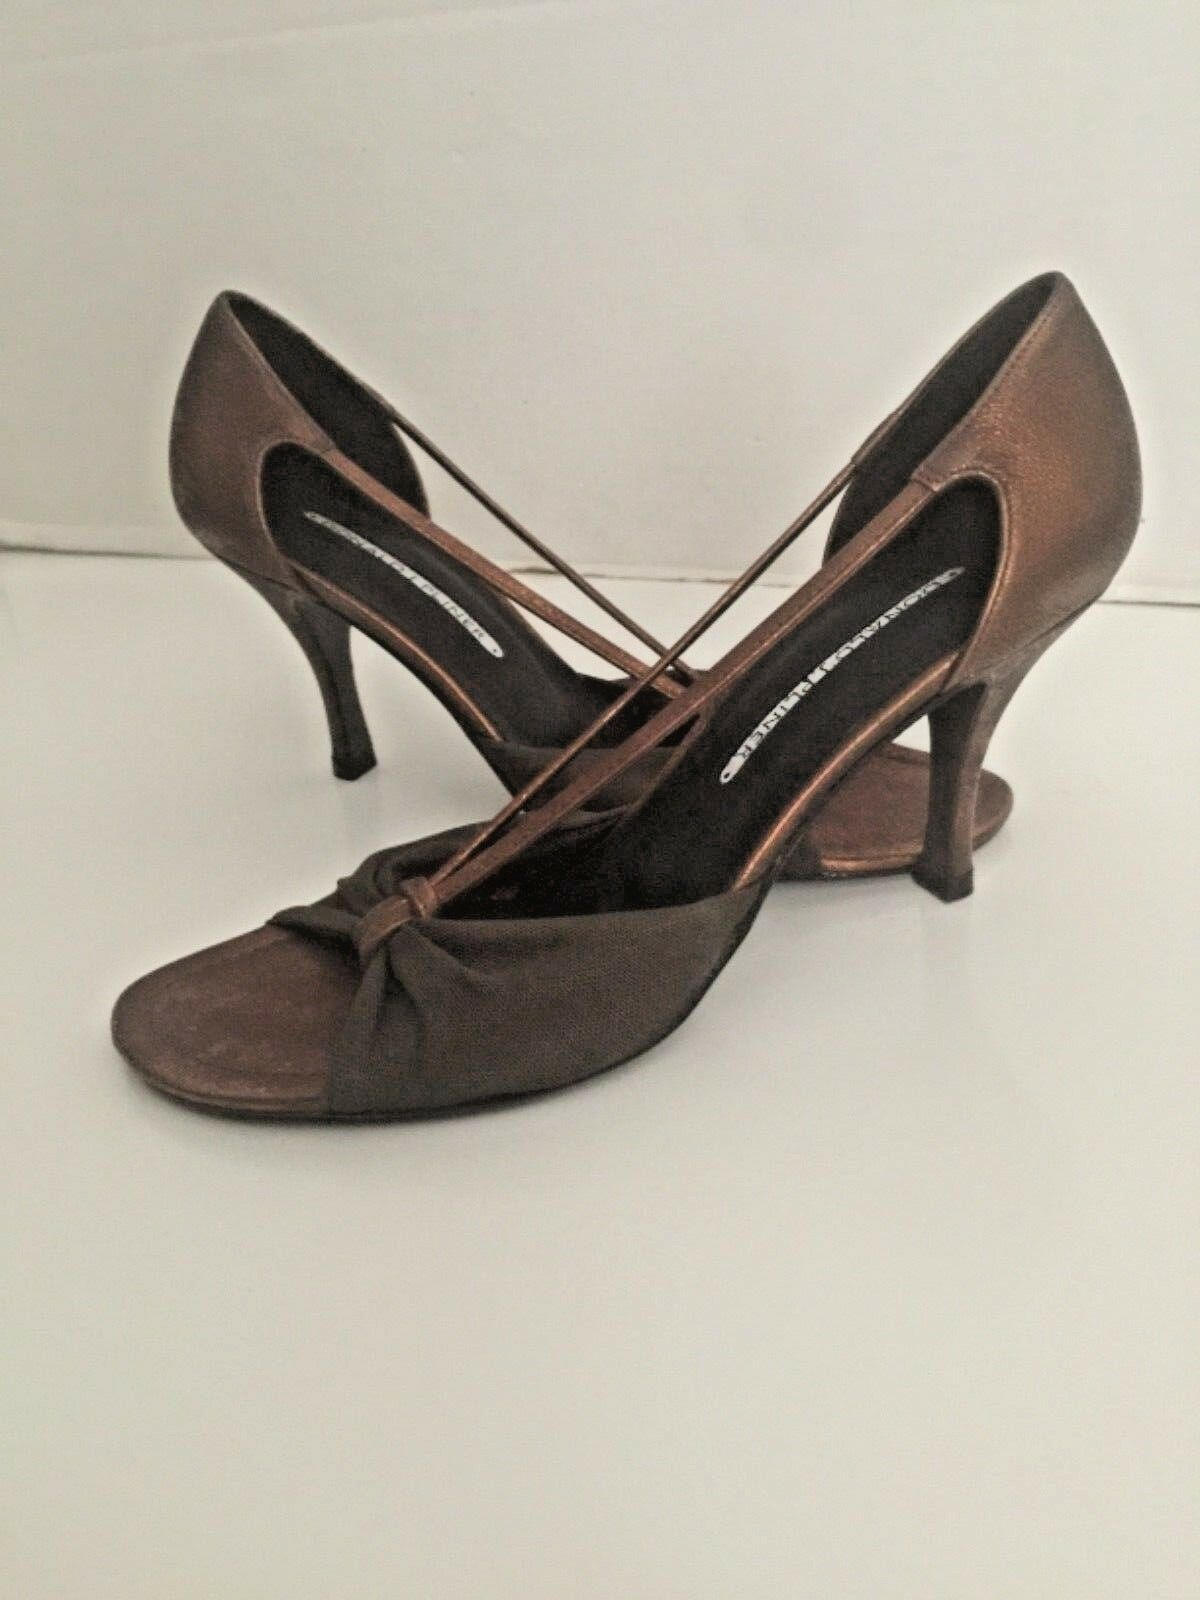 Donald Pliner  JJ Bronze Antique Metallic Leather Elastic Fabric Strappy scarpe 8  grande sconto